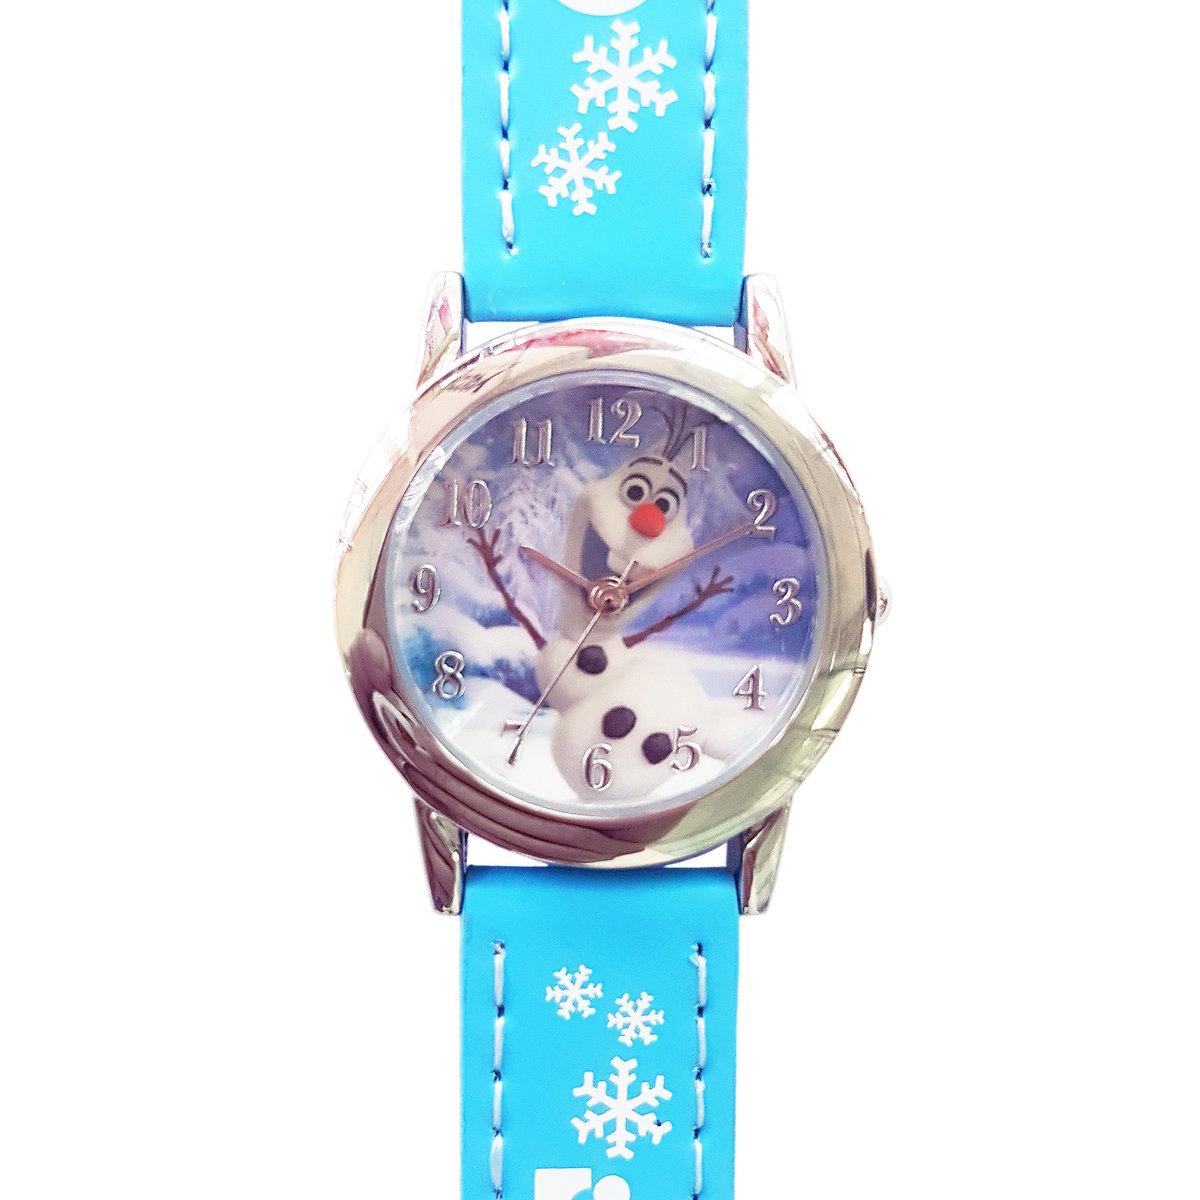 DISNEY FROZEN - Kids wrist watch - Blue color (Licensed by Disney)